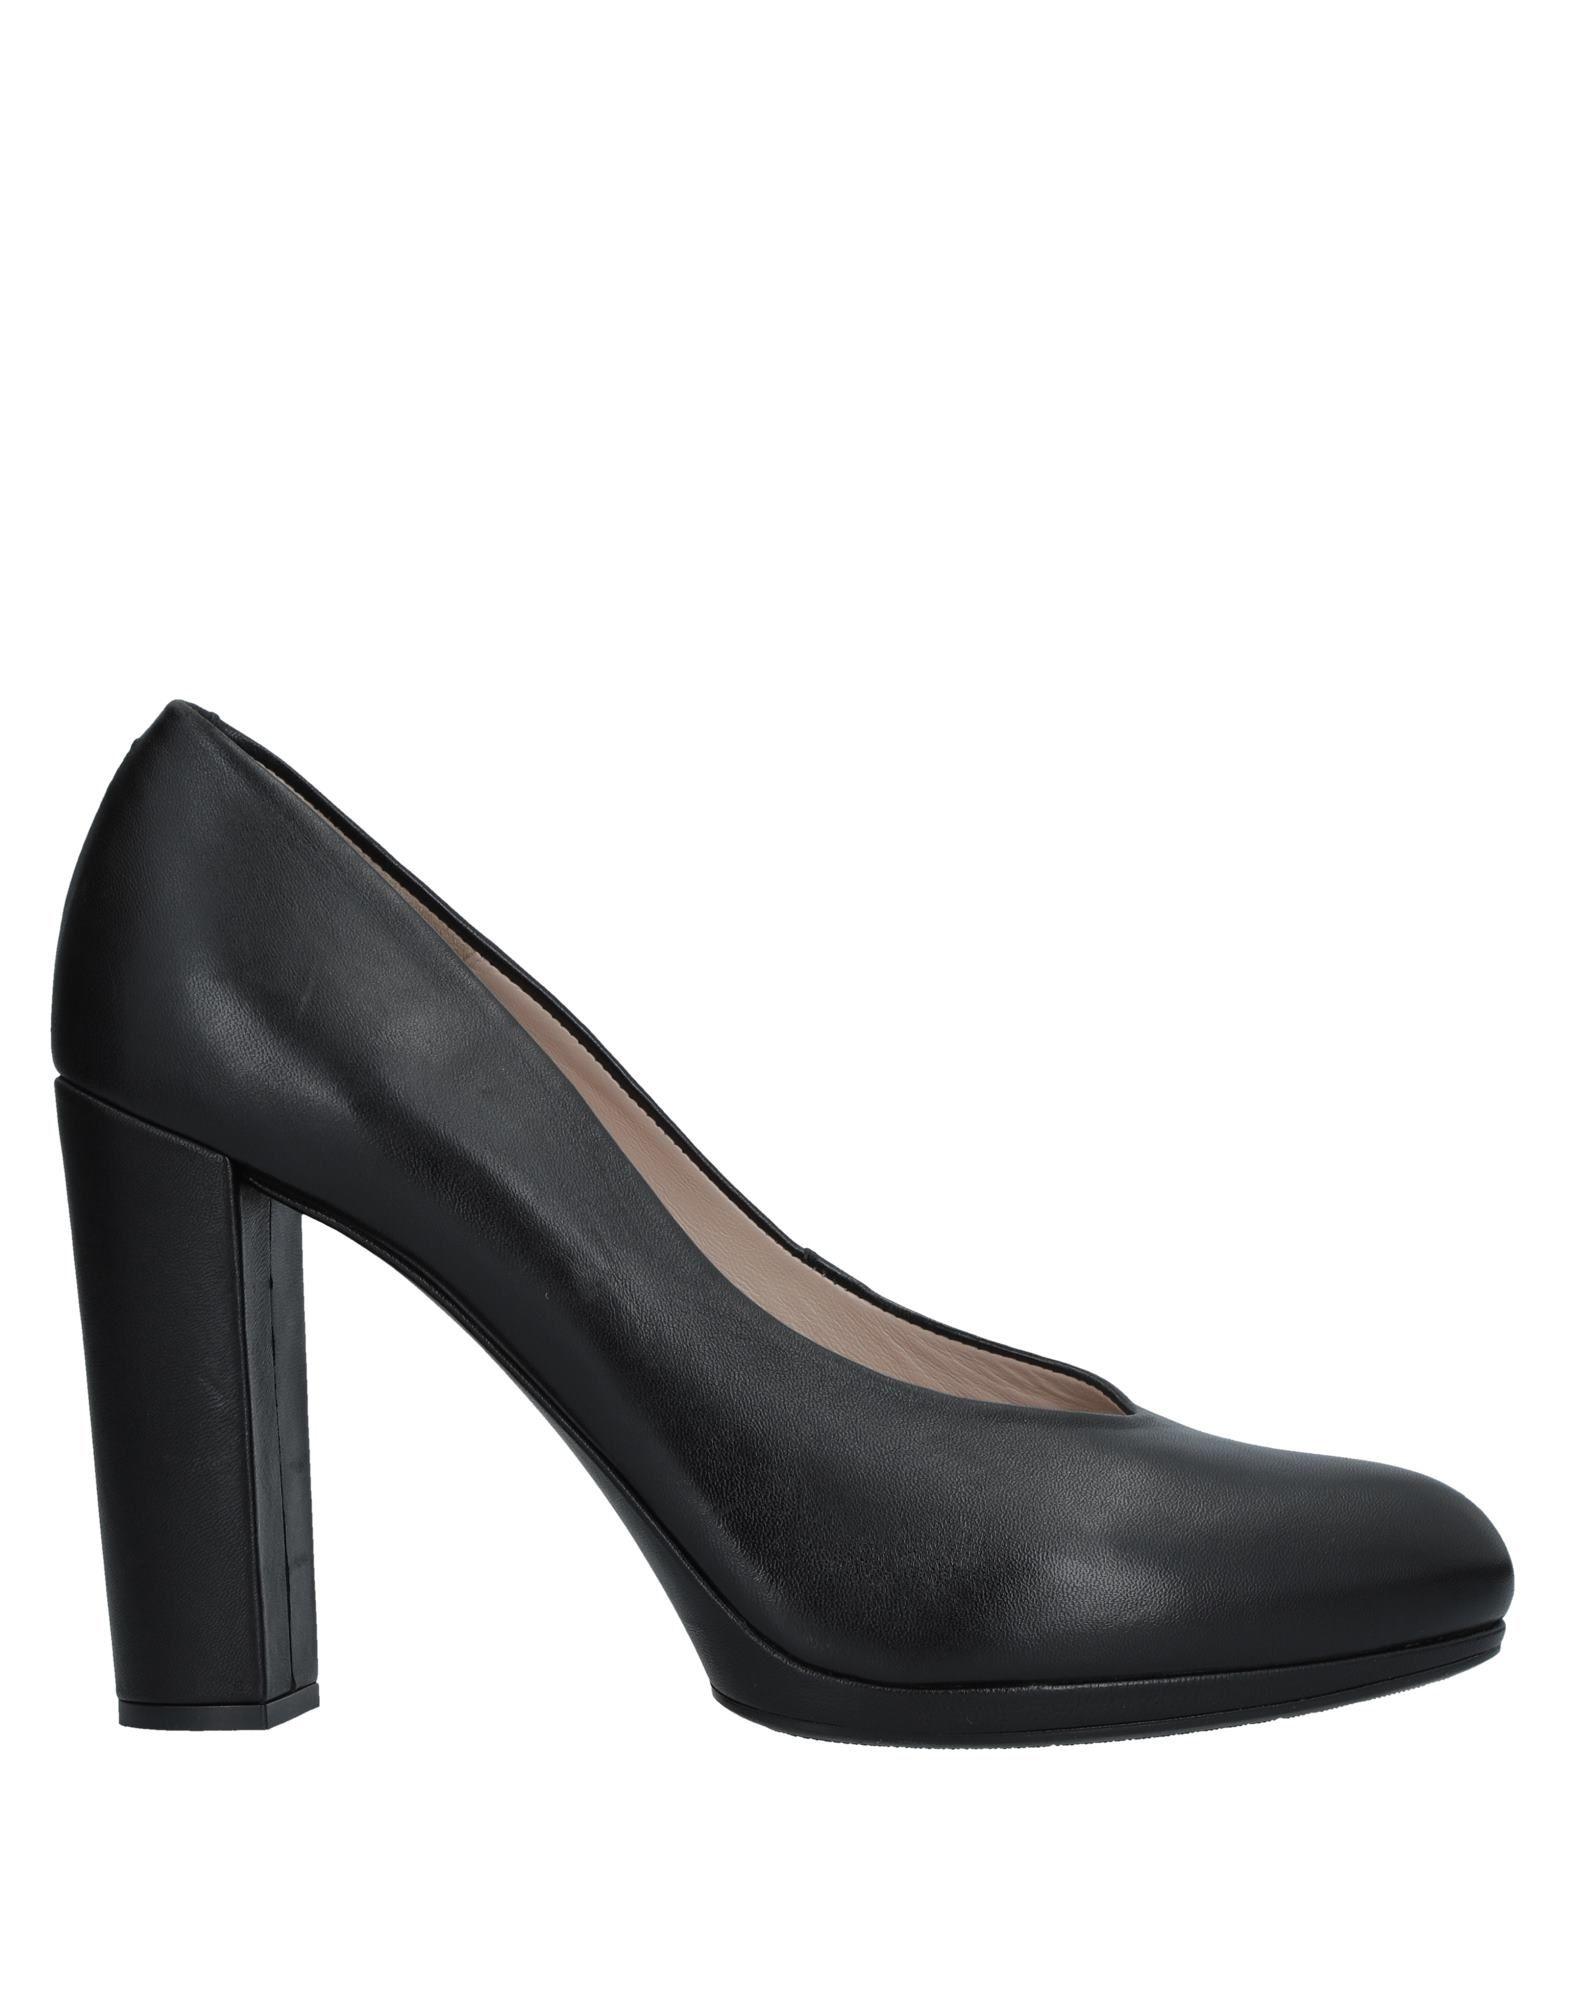 Unisa Pumps Damen  11526272OC Gute Qualität beliebte Schuhe